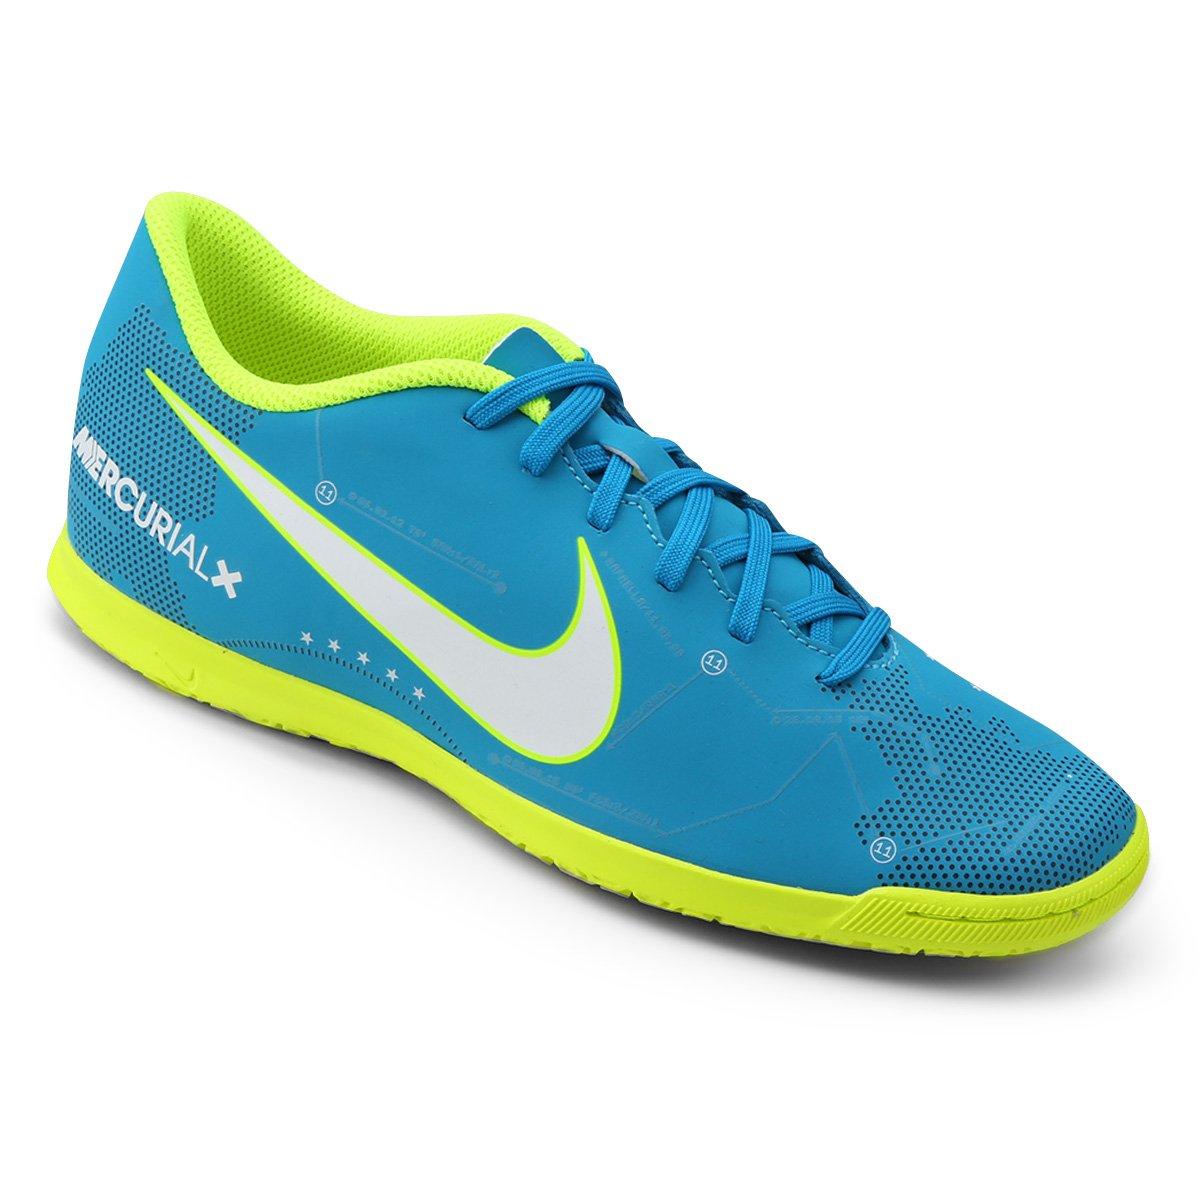 ... greece chuteira futsal nike mercurial vortex 3 neymar jr ic masculina  azul e branco 7c4cf 5c0dd 0a518ebd225c1